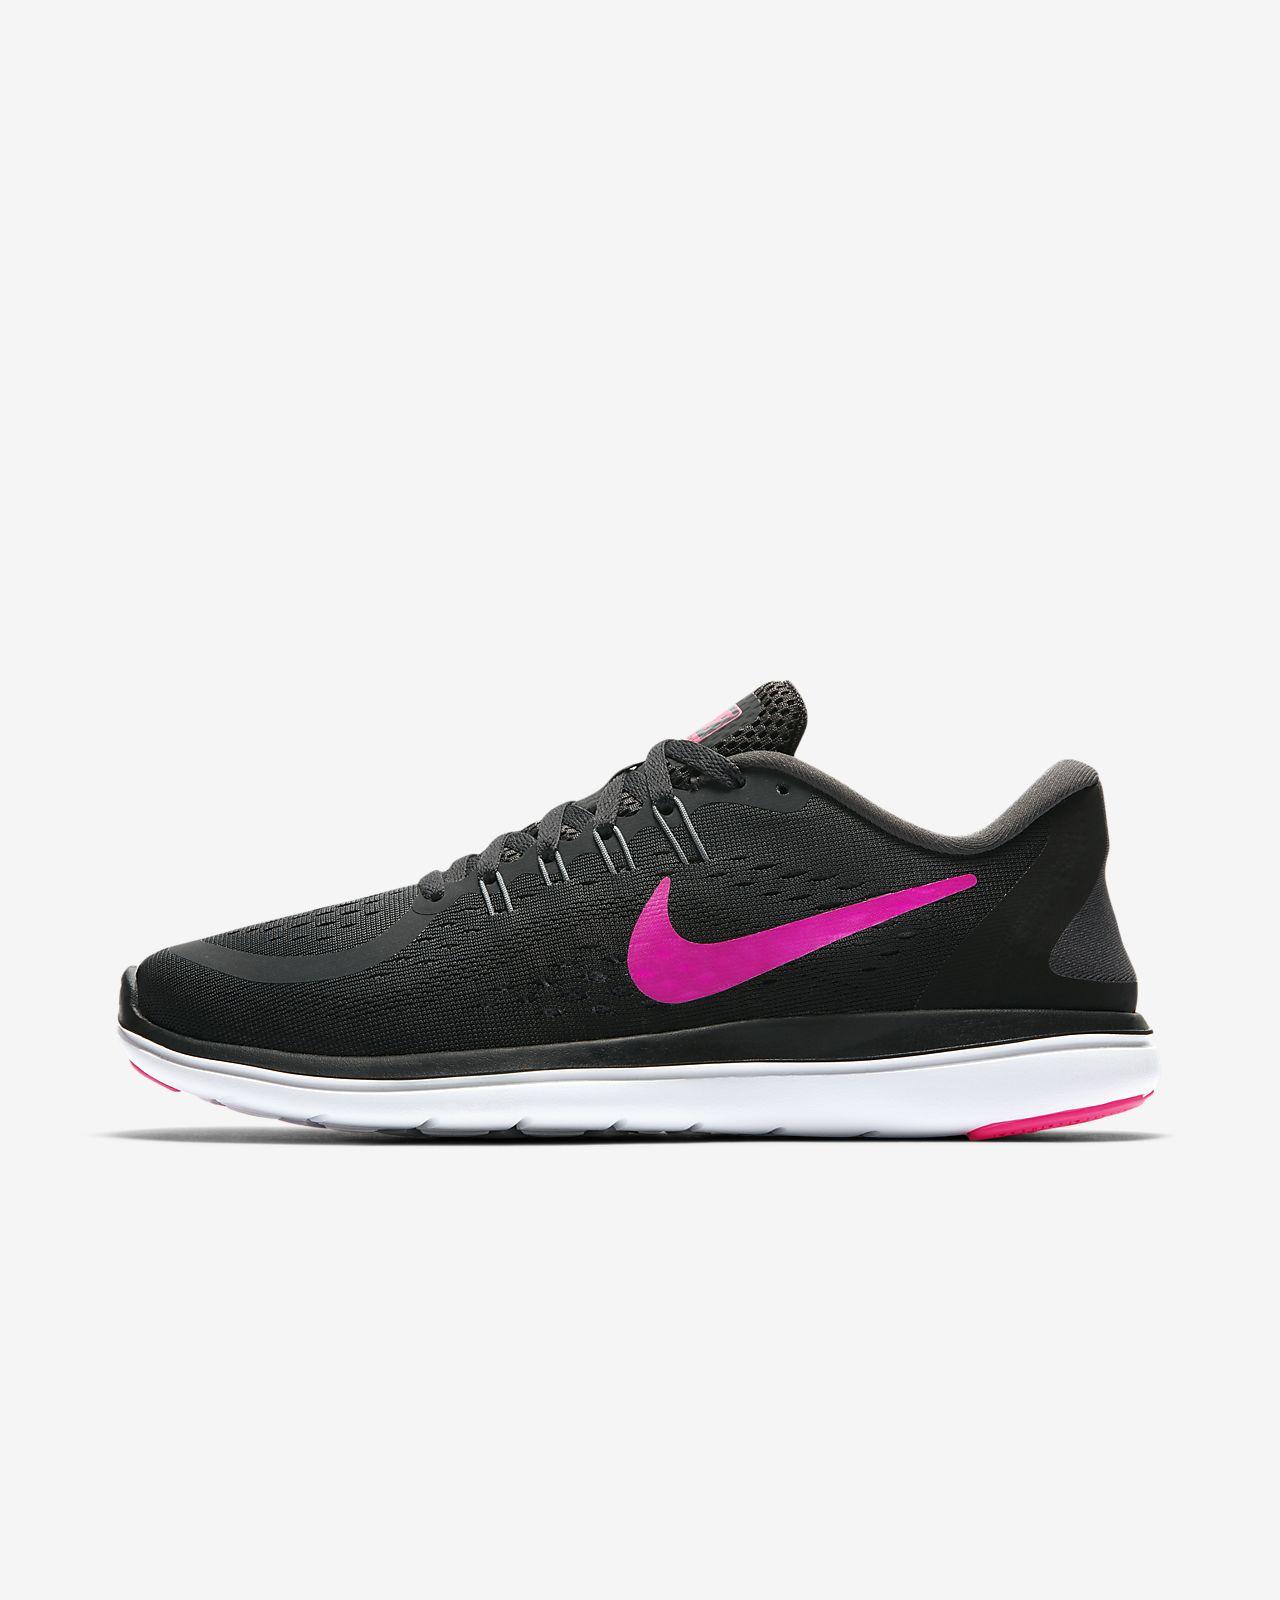 Cheap Nike Flex Running Shoes